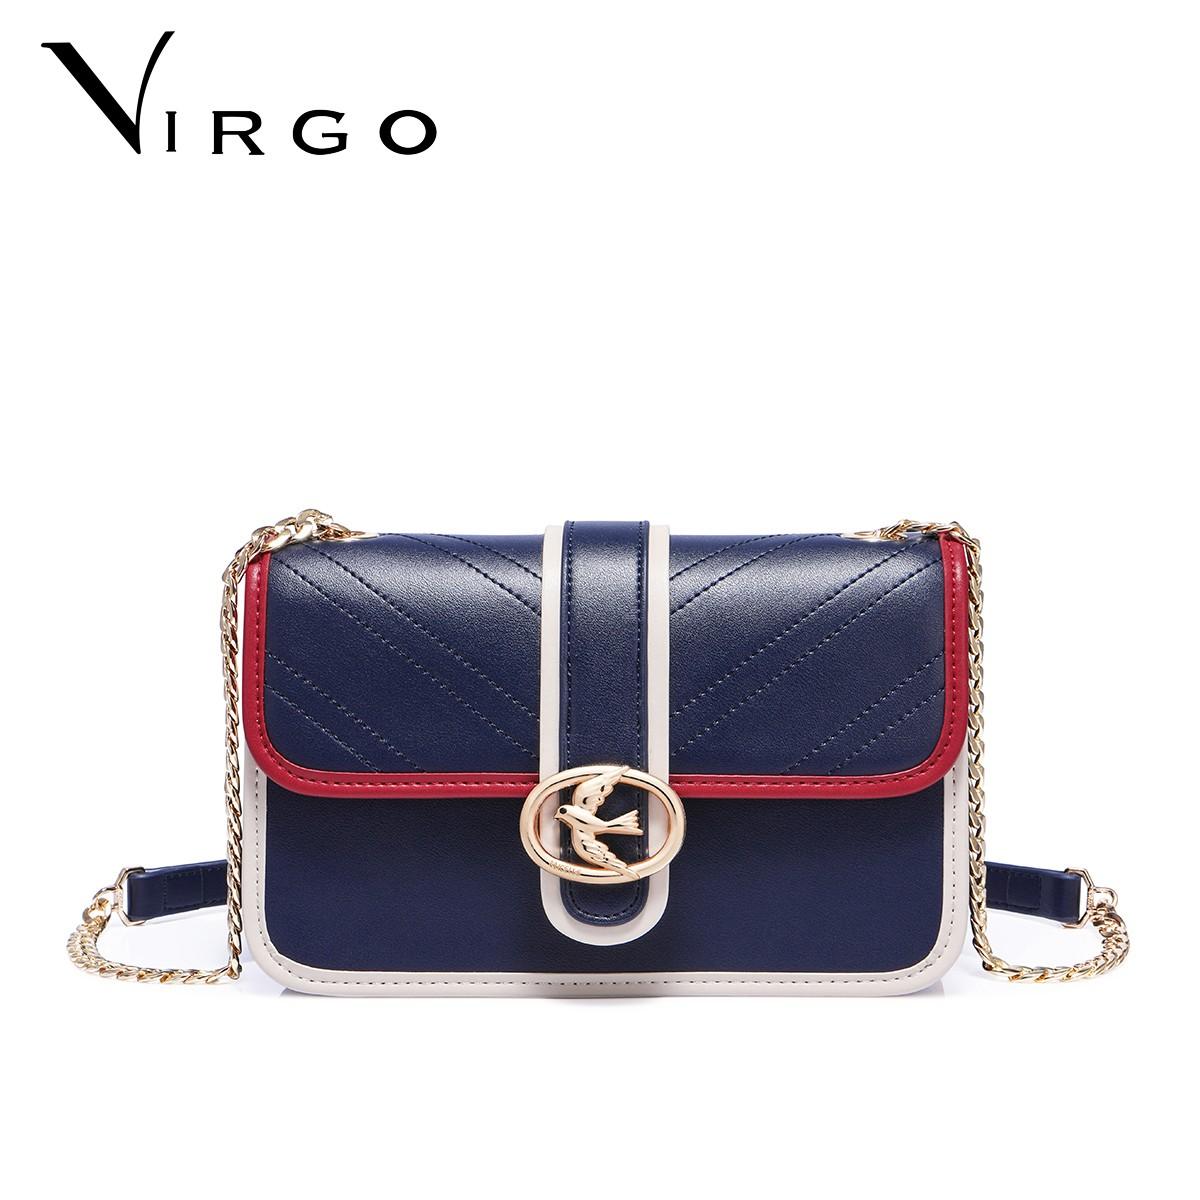 Túi đeo chéo nữ thời trang Nucelle Virgo VG548